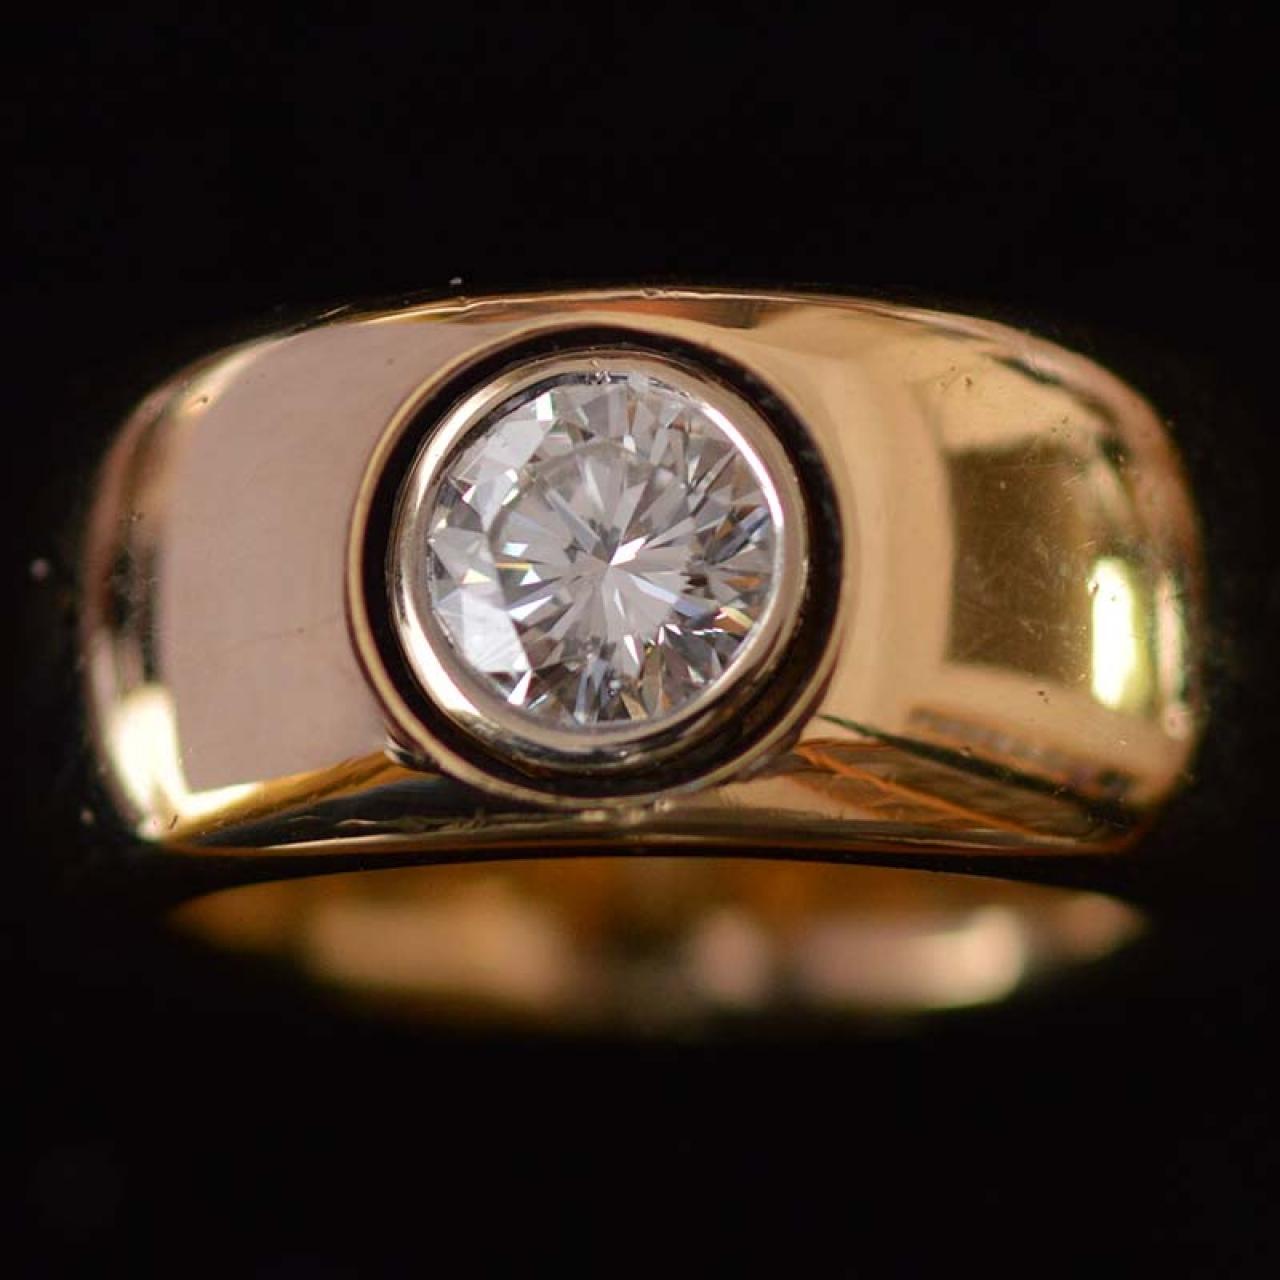 1,35 ct diamond solid gold ring - Rocks and Clocks